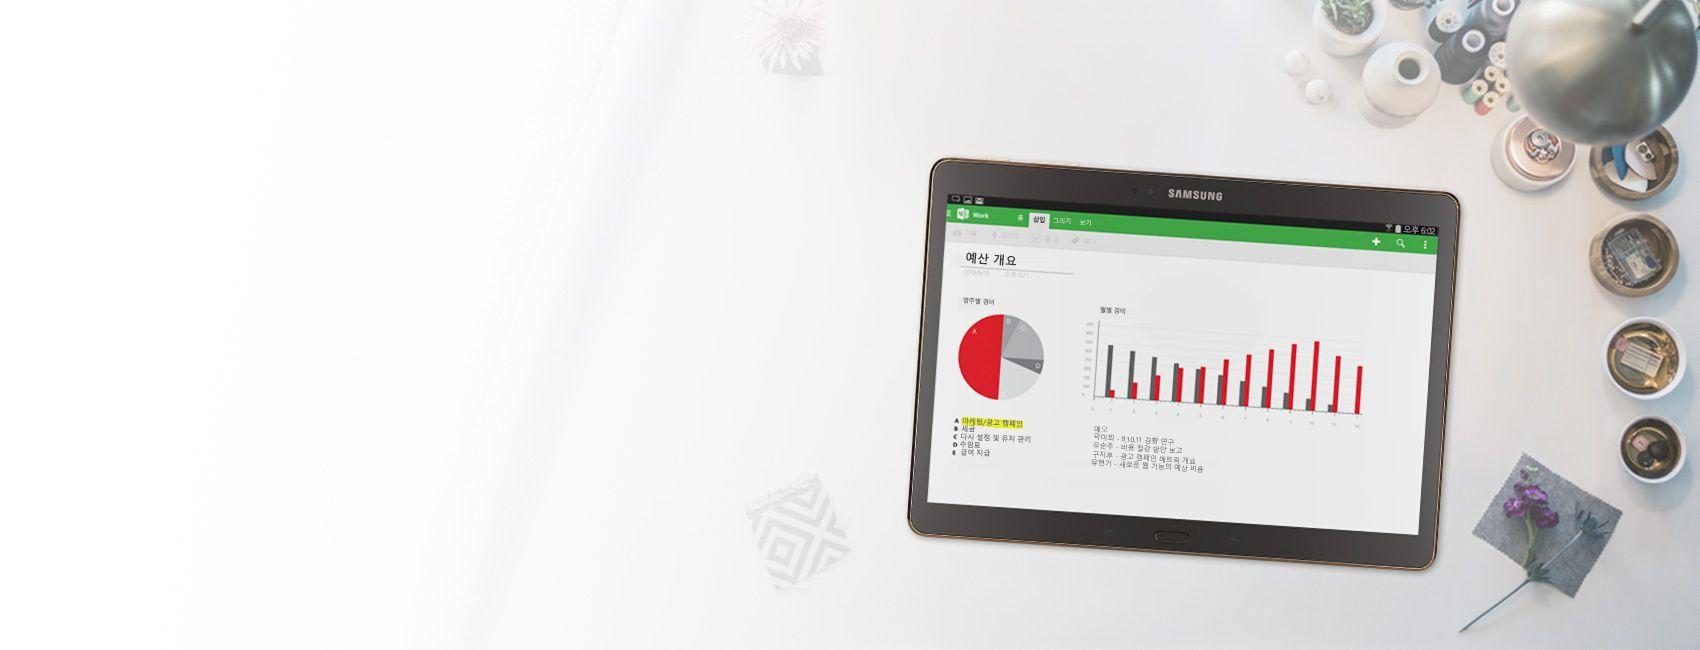 OneNote 전자 필기장에 예산 개요 차트 및 그래프가 표시된 태블릿